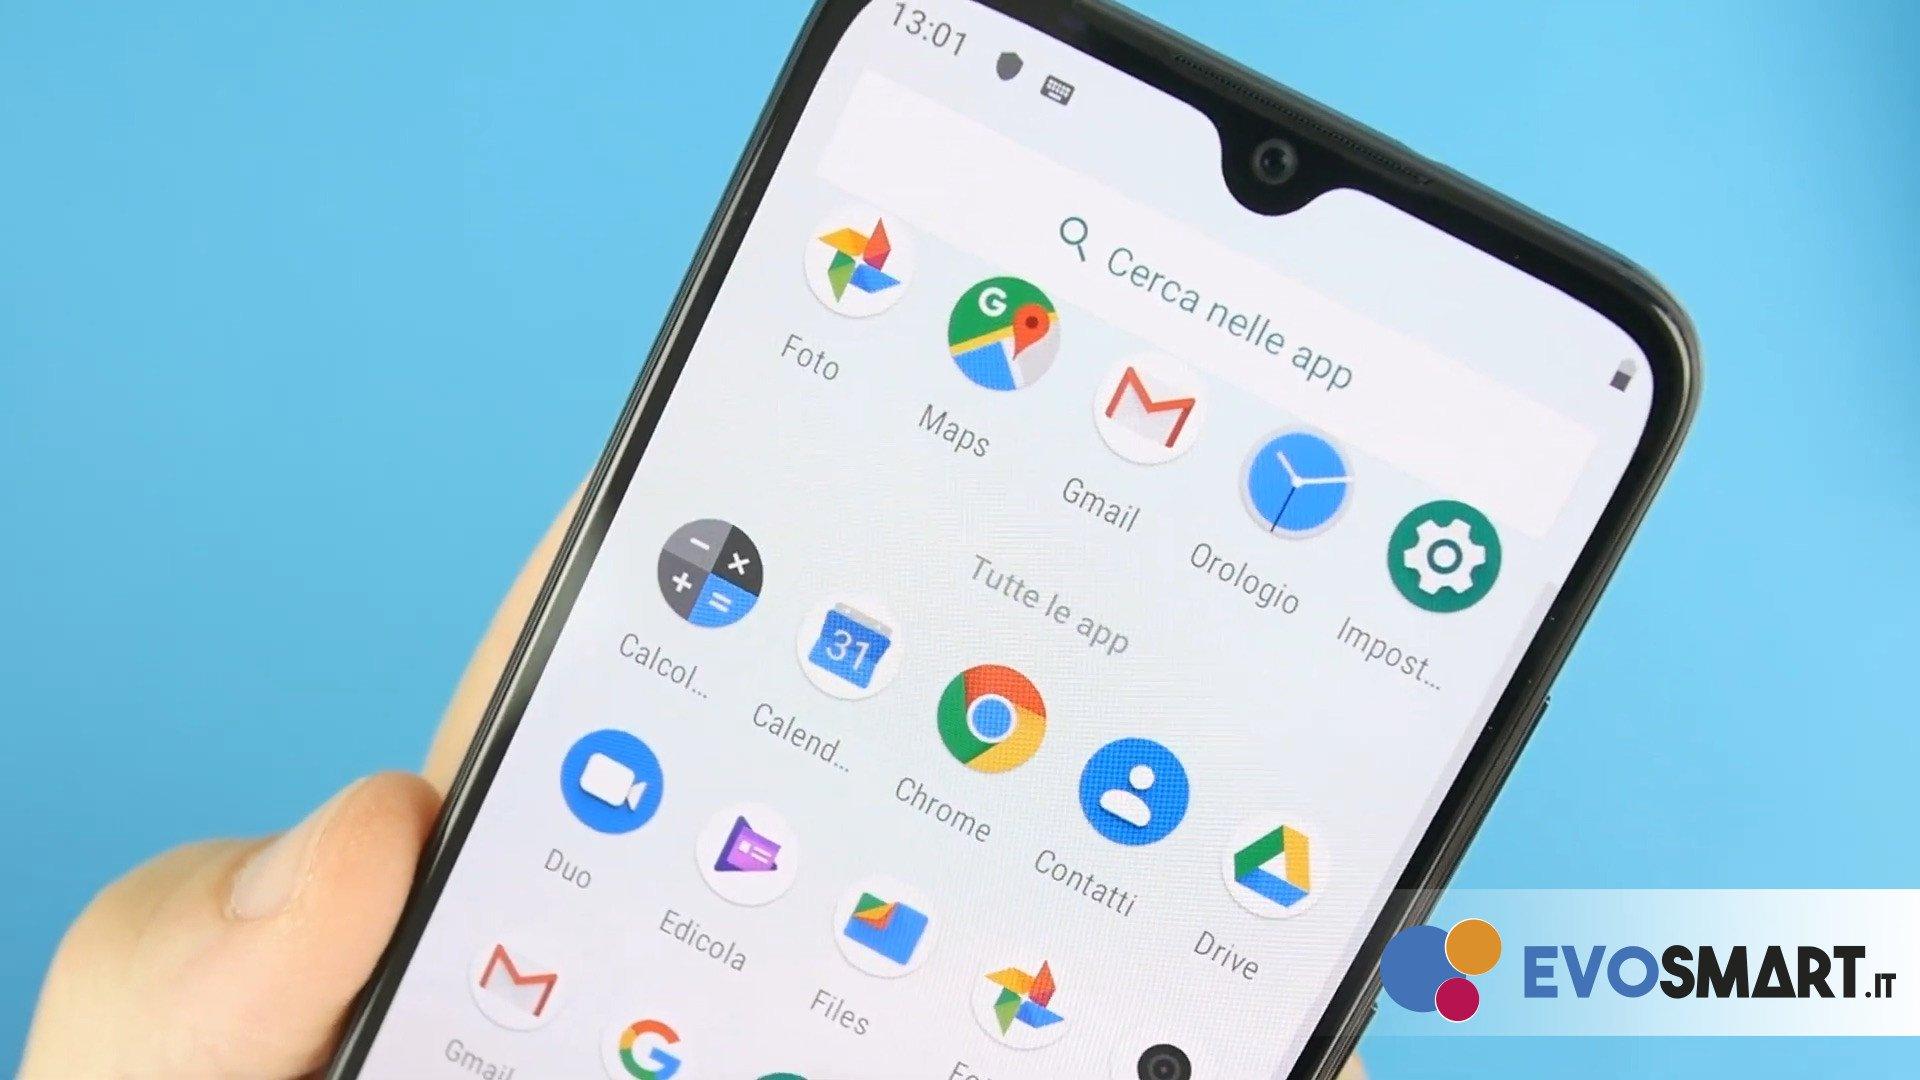 Xiaomi Mi A3 Pro: проверить сертификацию